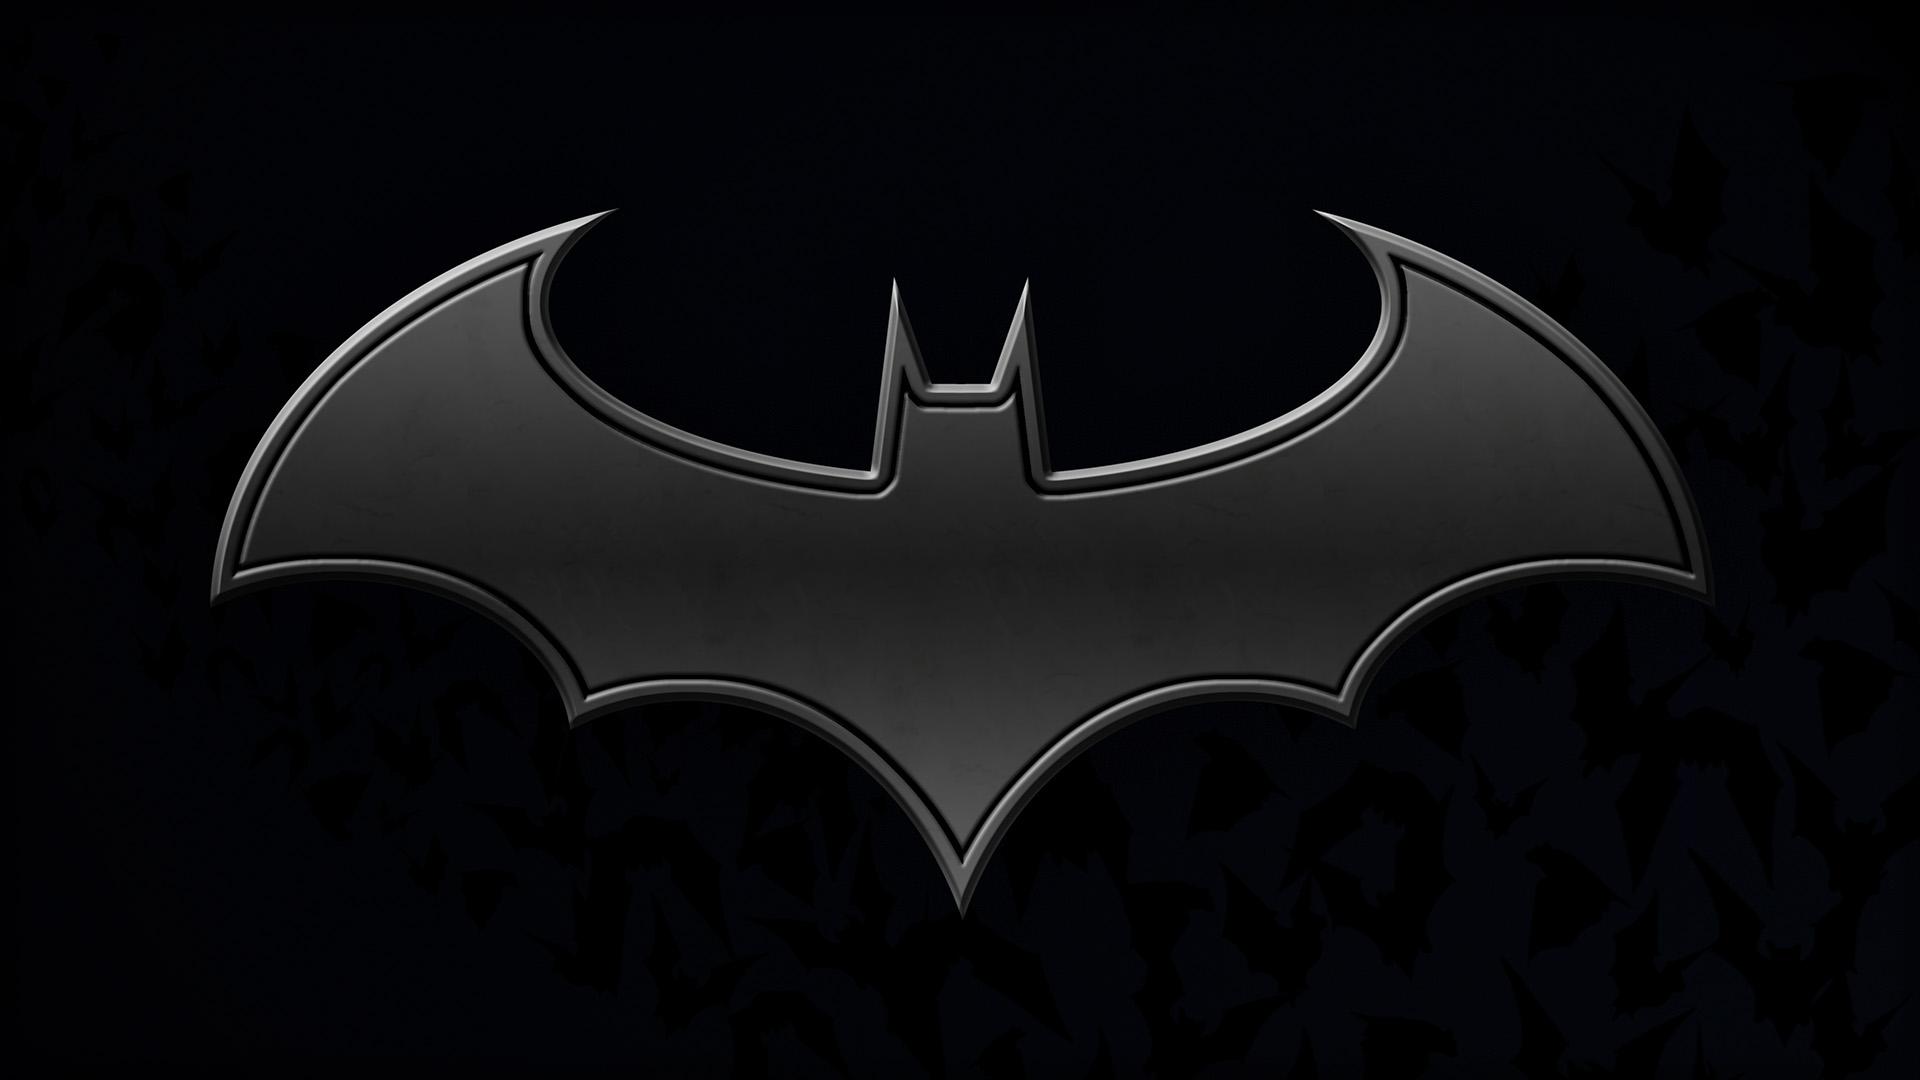 bat man sign how to draw batman logo youtube sign man bat